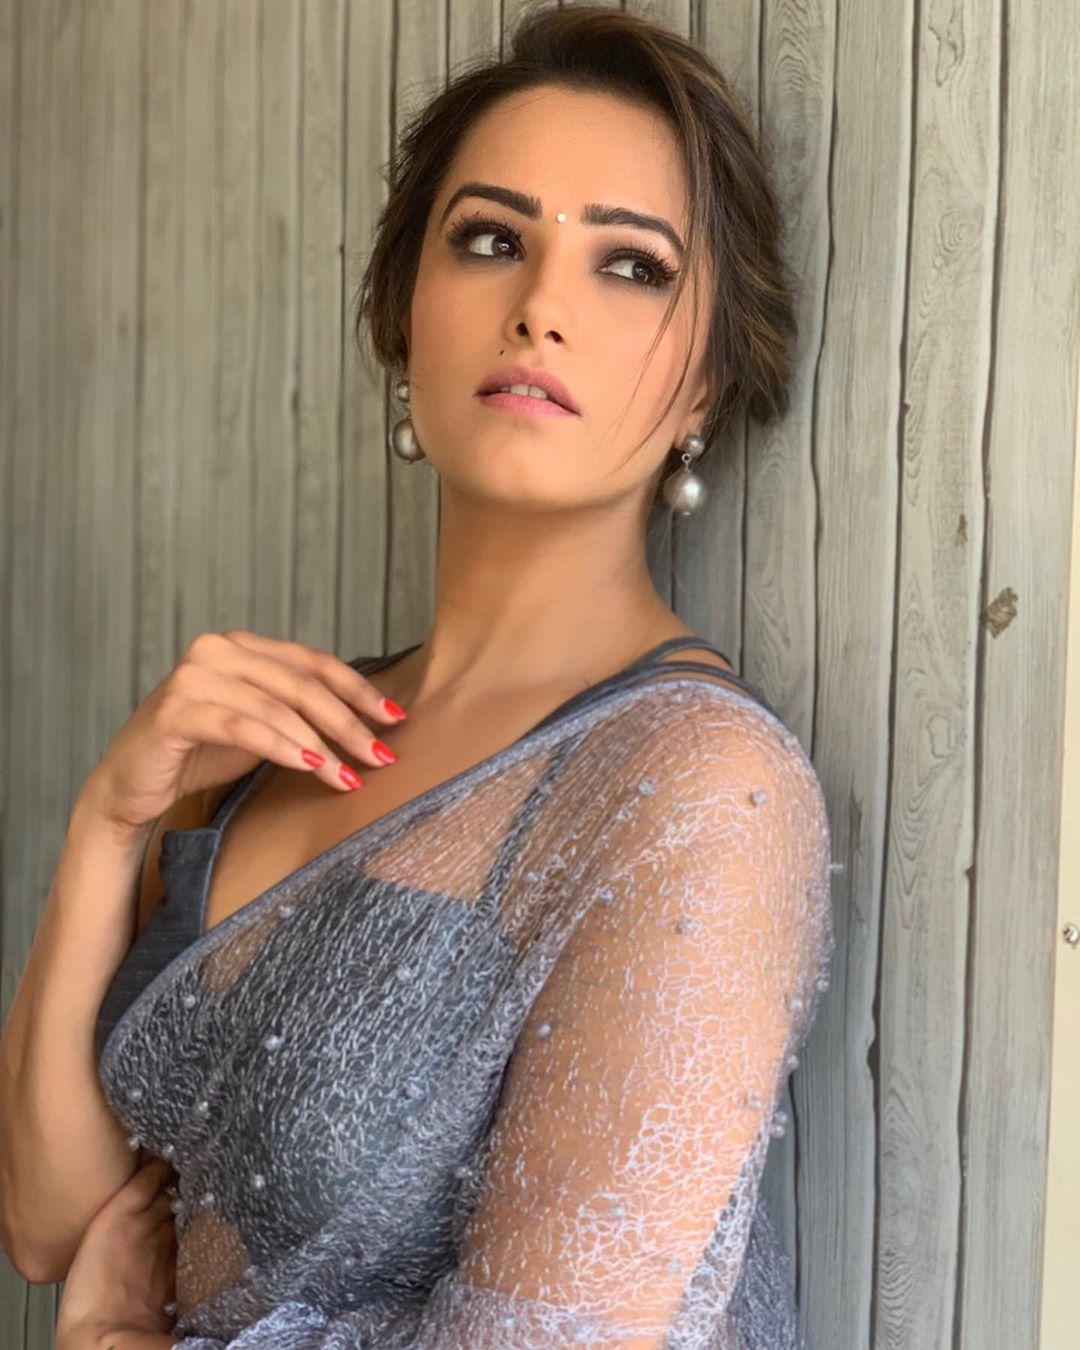 Bollywood Tadka,अनीता हसनंदानी इमेज,अनीता हसनंदानी फोटो,अनीता हसनंदानी पिक्चर,